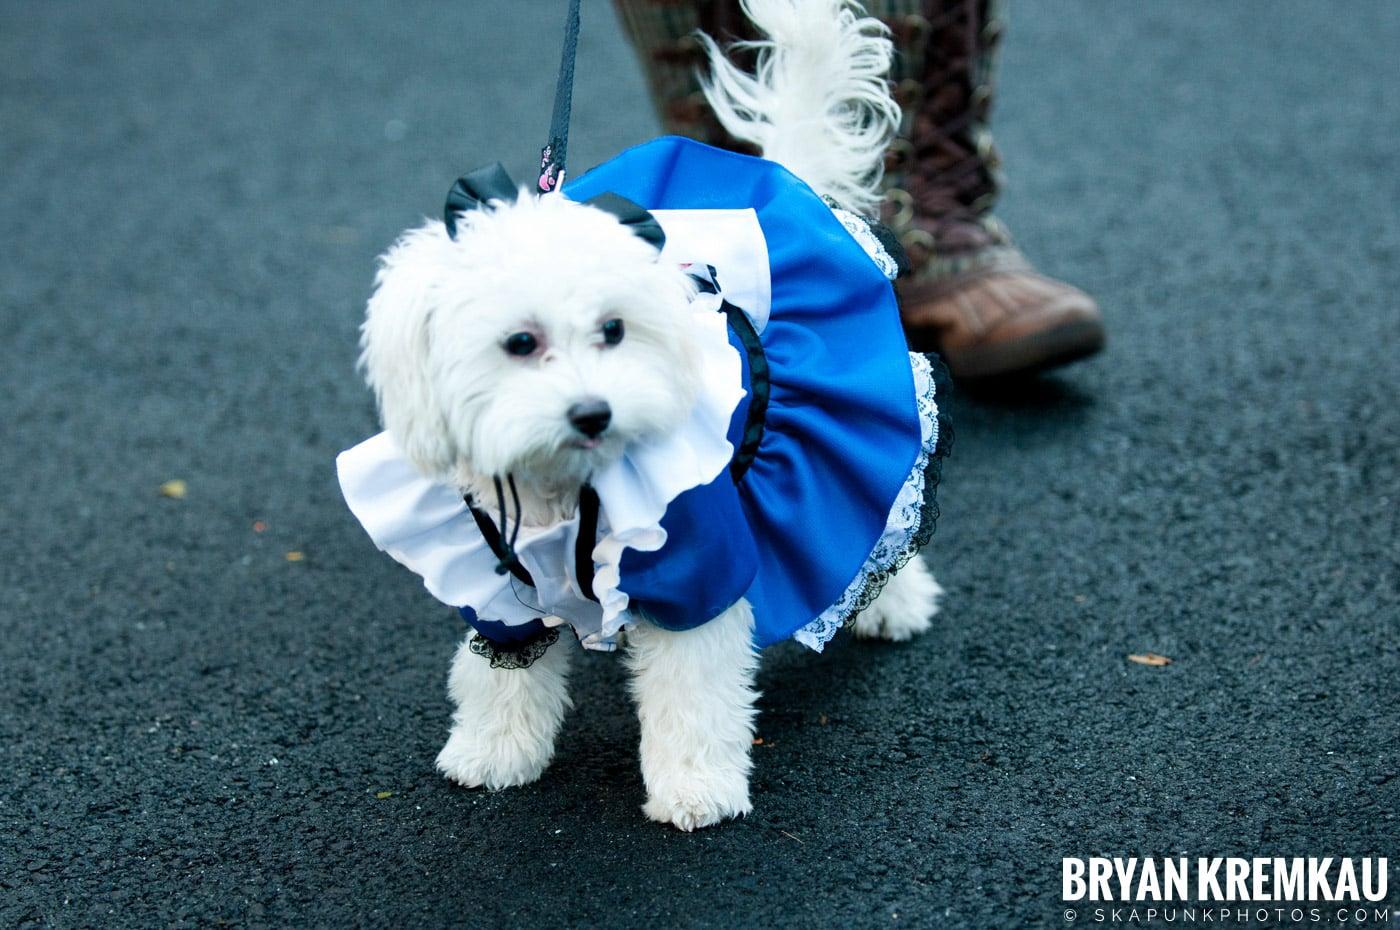 Paulus Hook Halloween Pet Parade 2011 @ Jersey City, NJ - 10.30.11 (39)